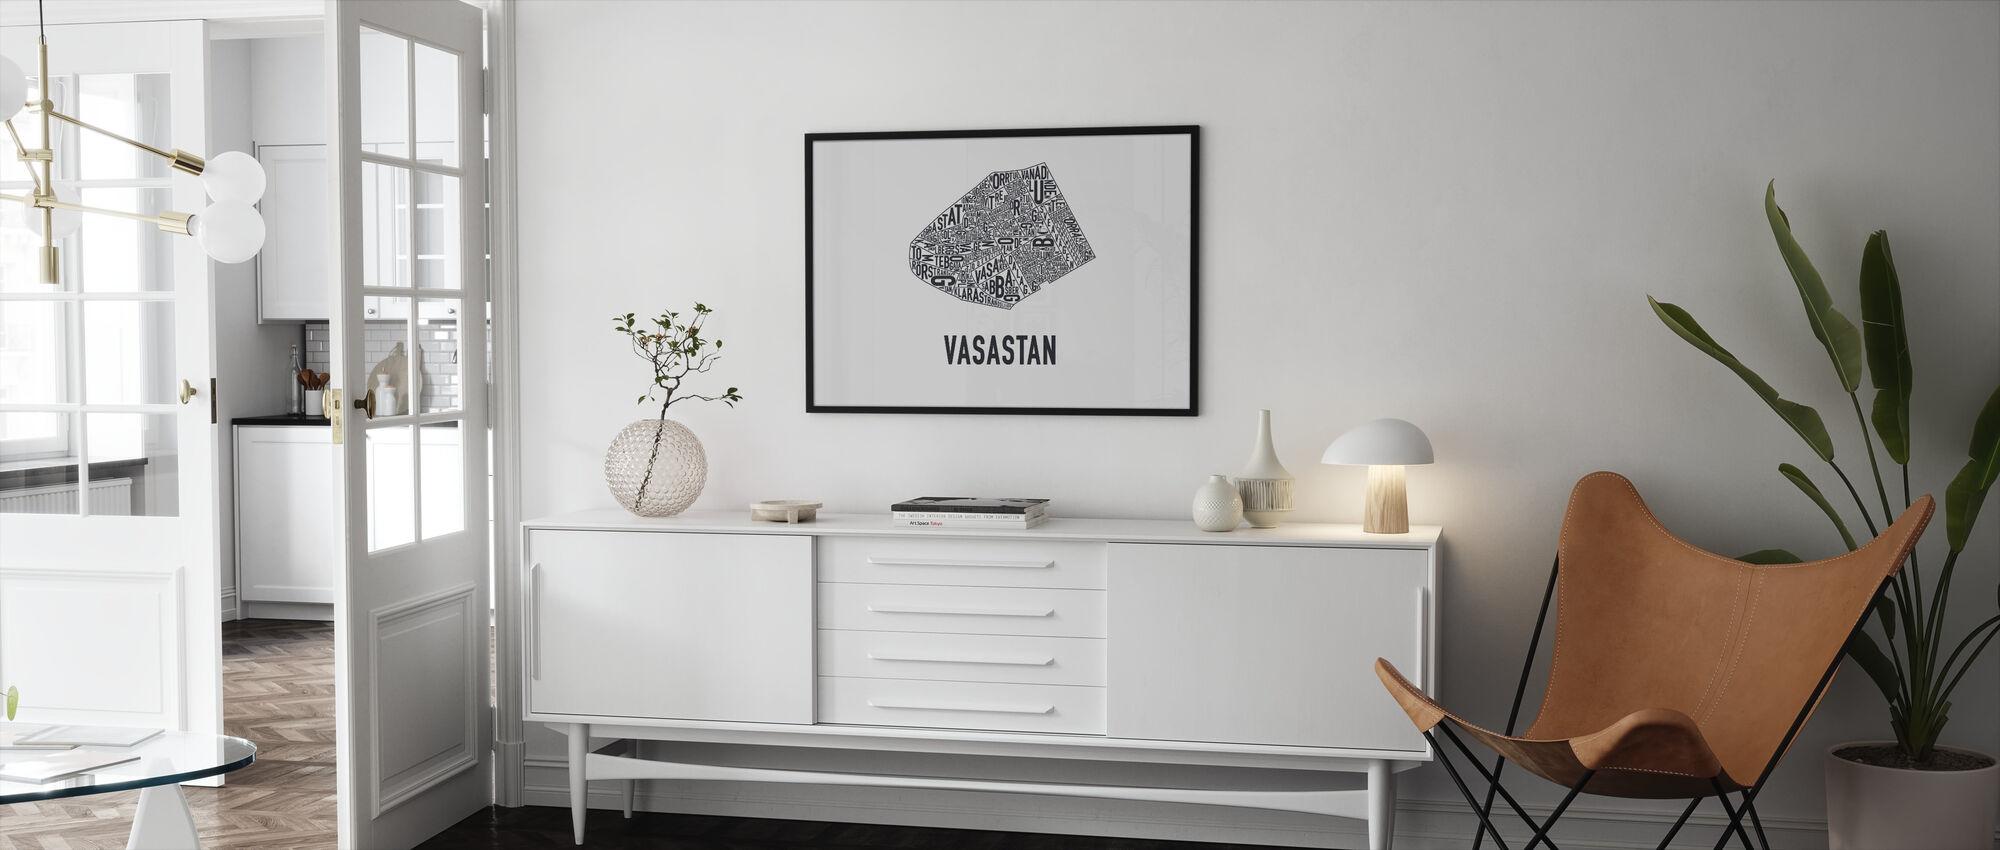 Vasastan - Framed print - Living Room